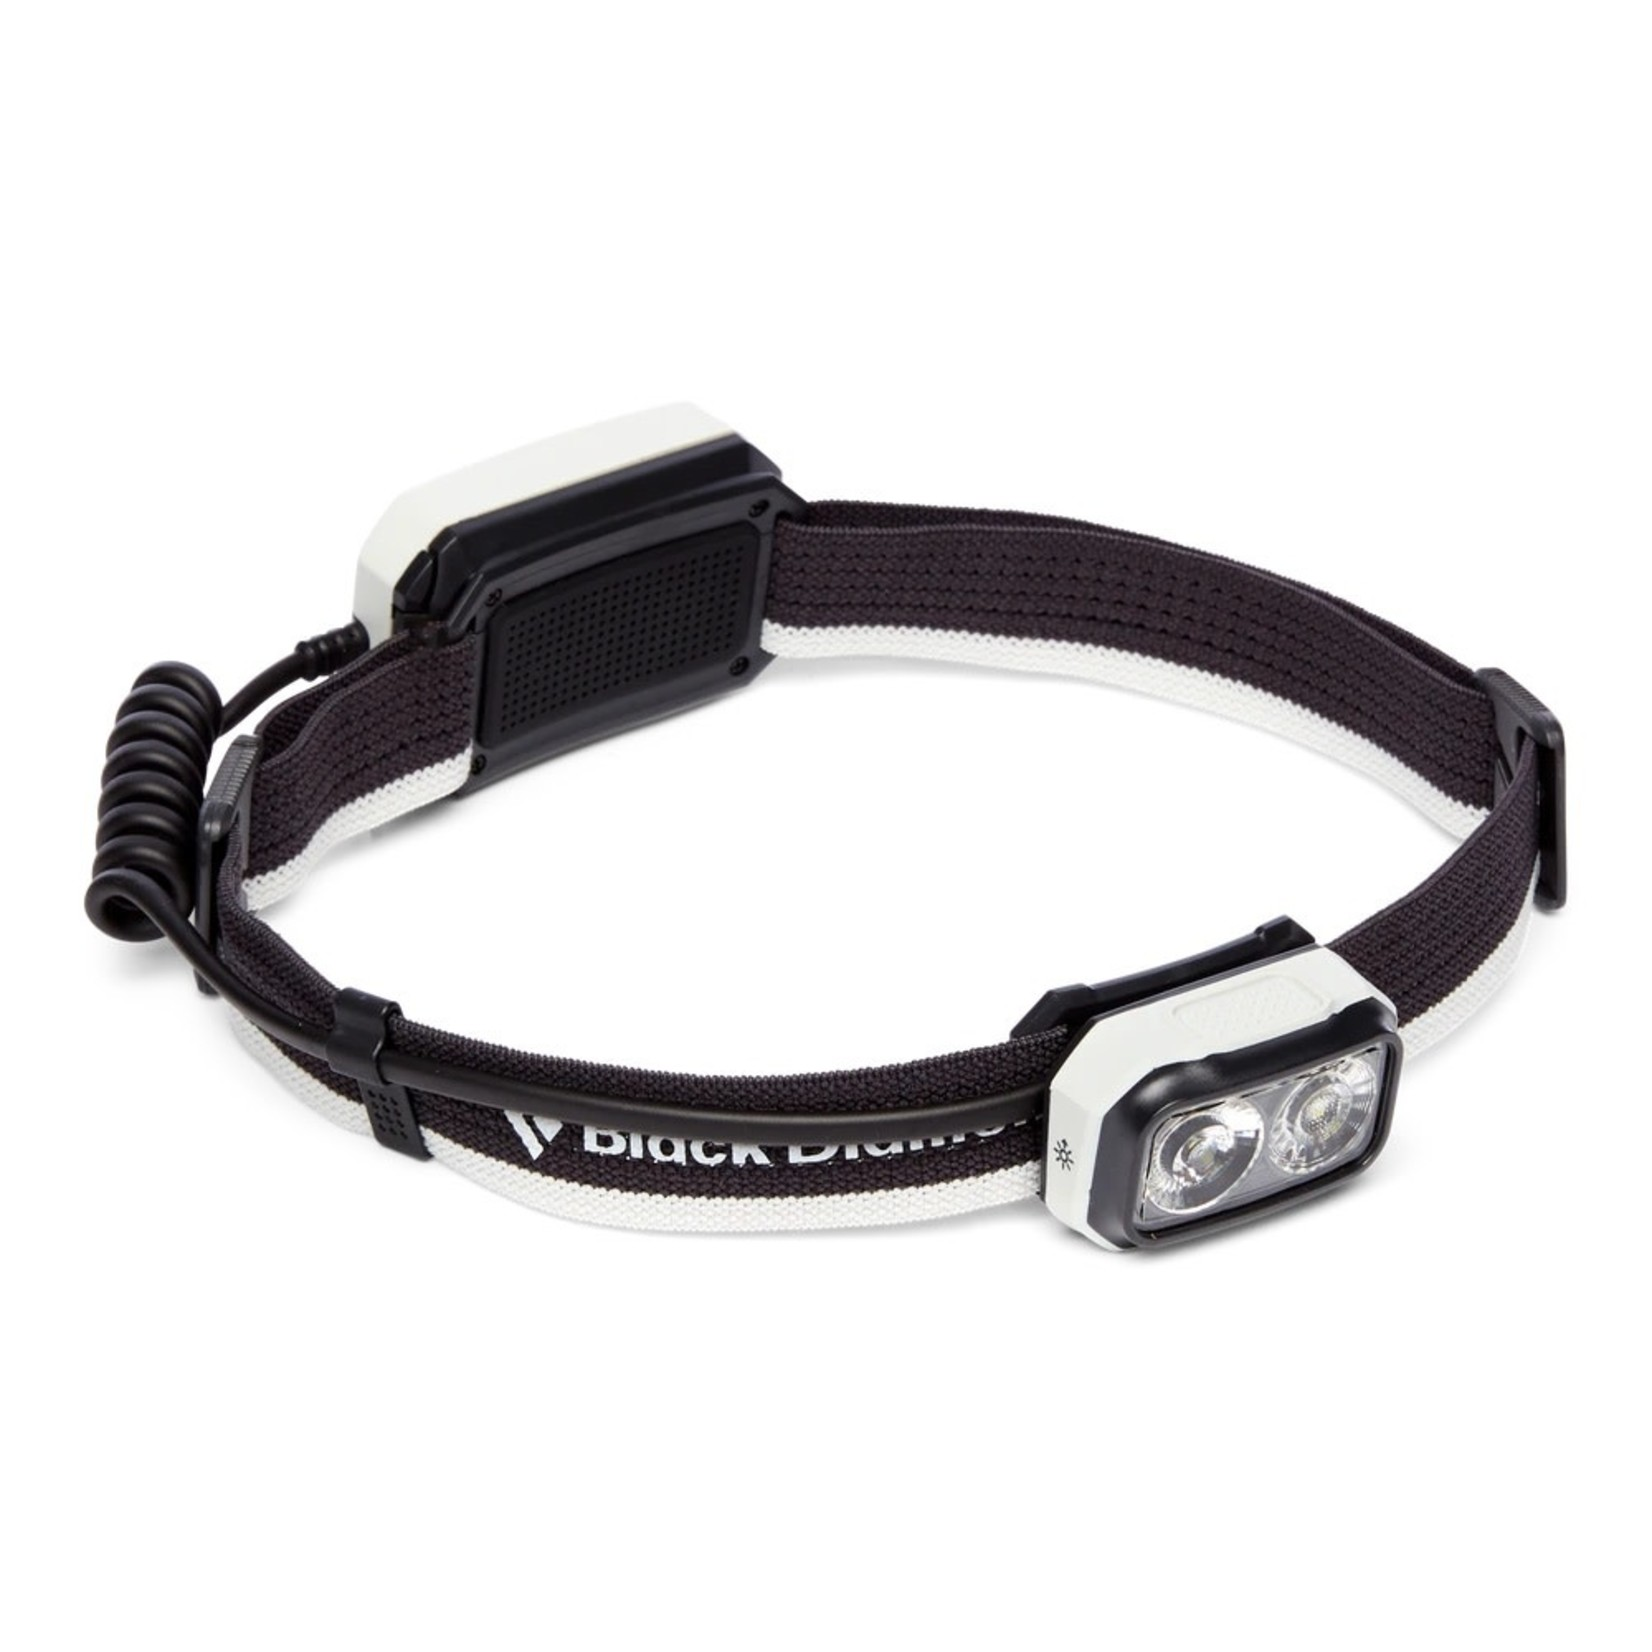 Black Diamond Lampe frontale Black Diamond Onsight 375